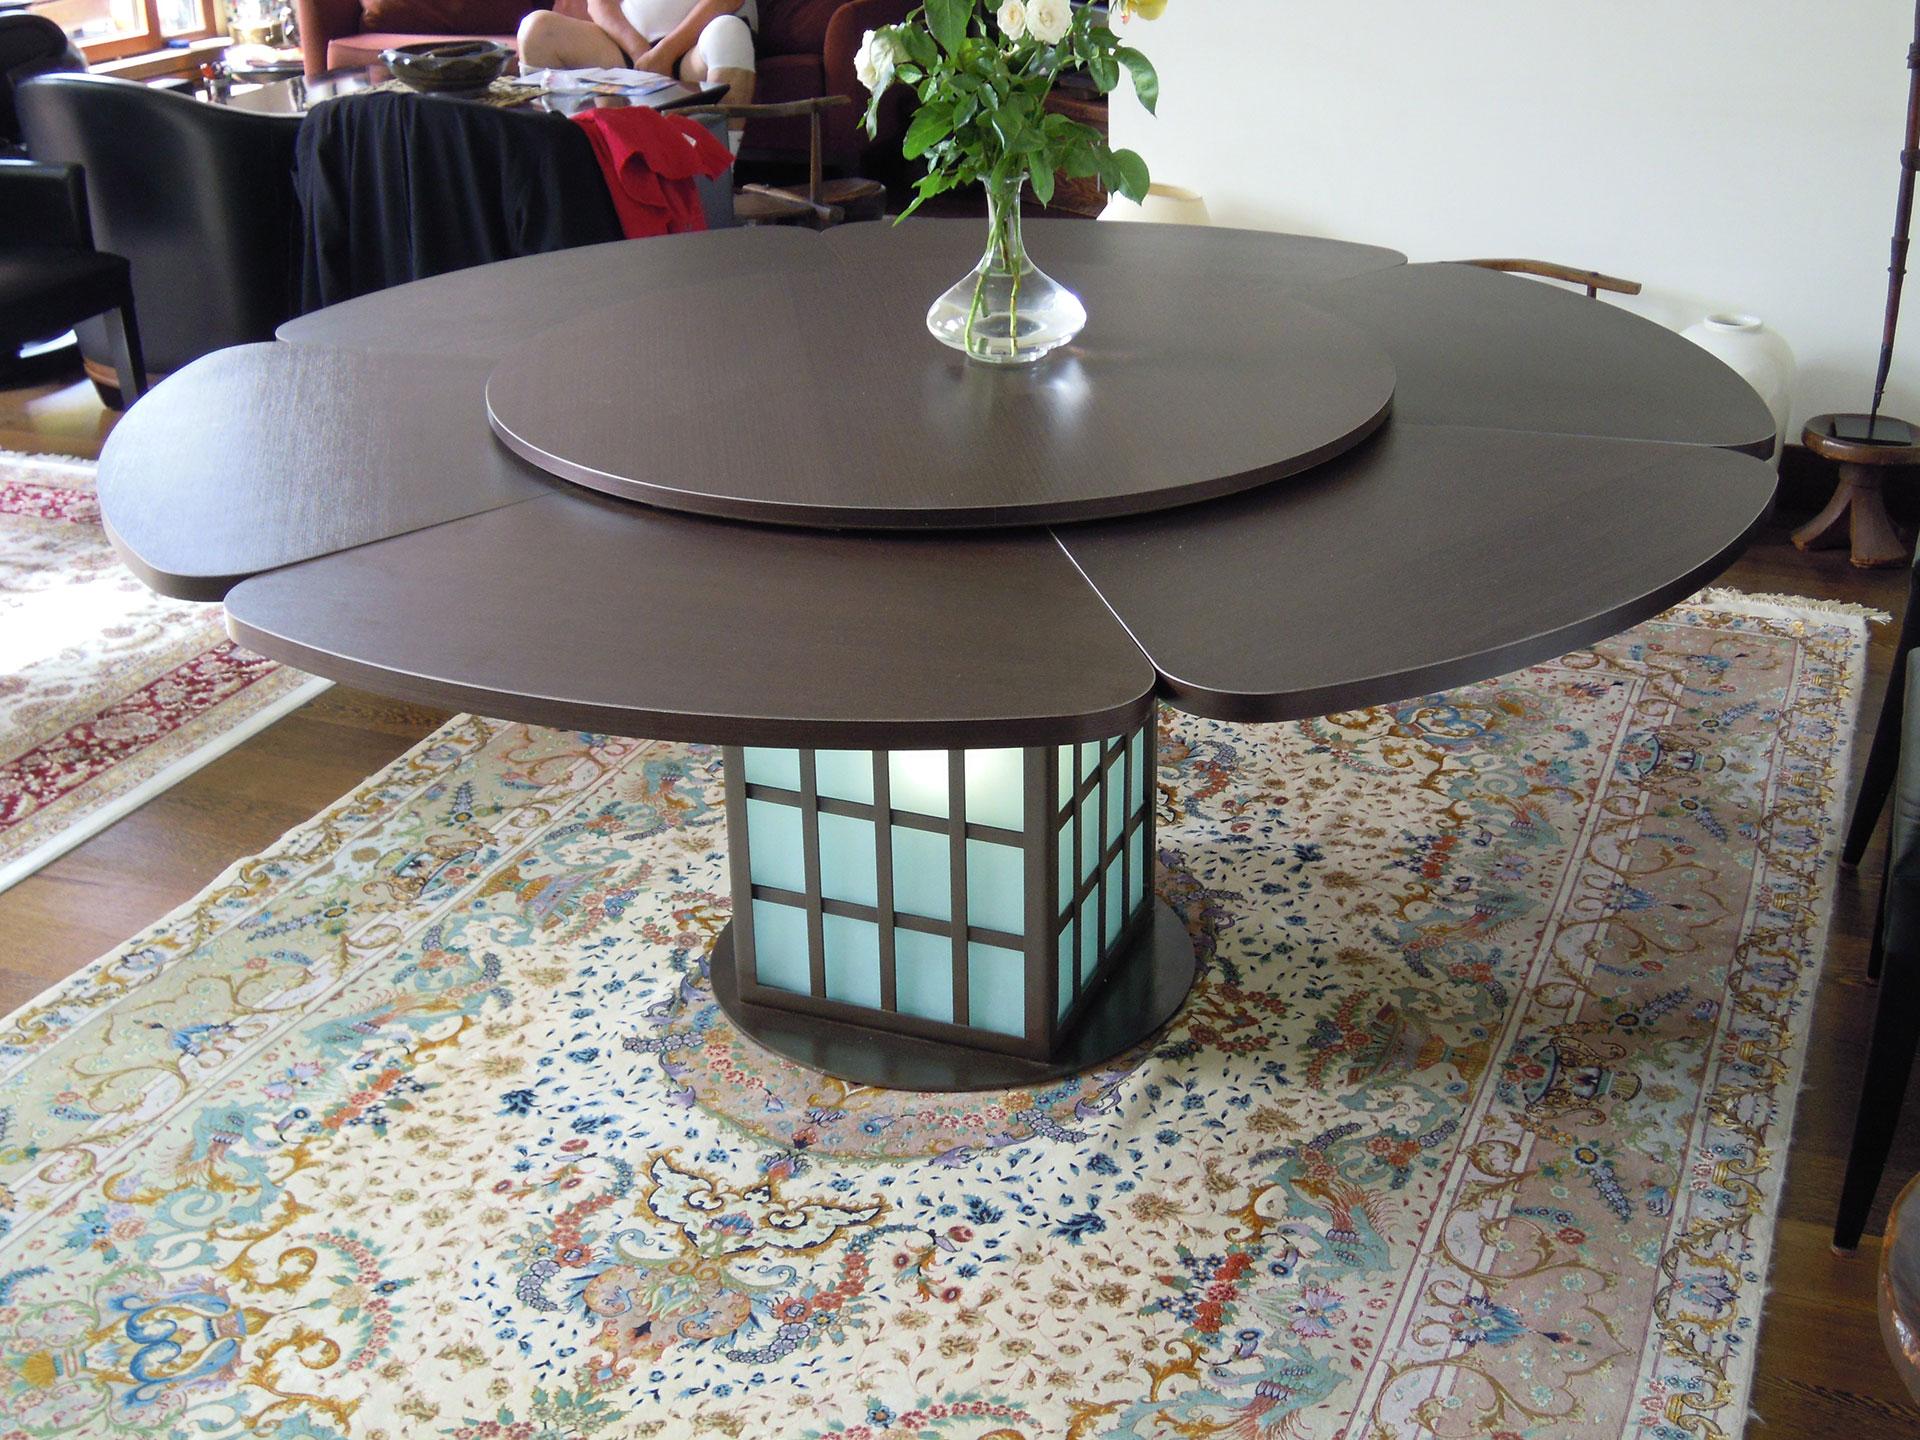 sakura-semi-ouvert-table-quasart